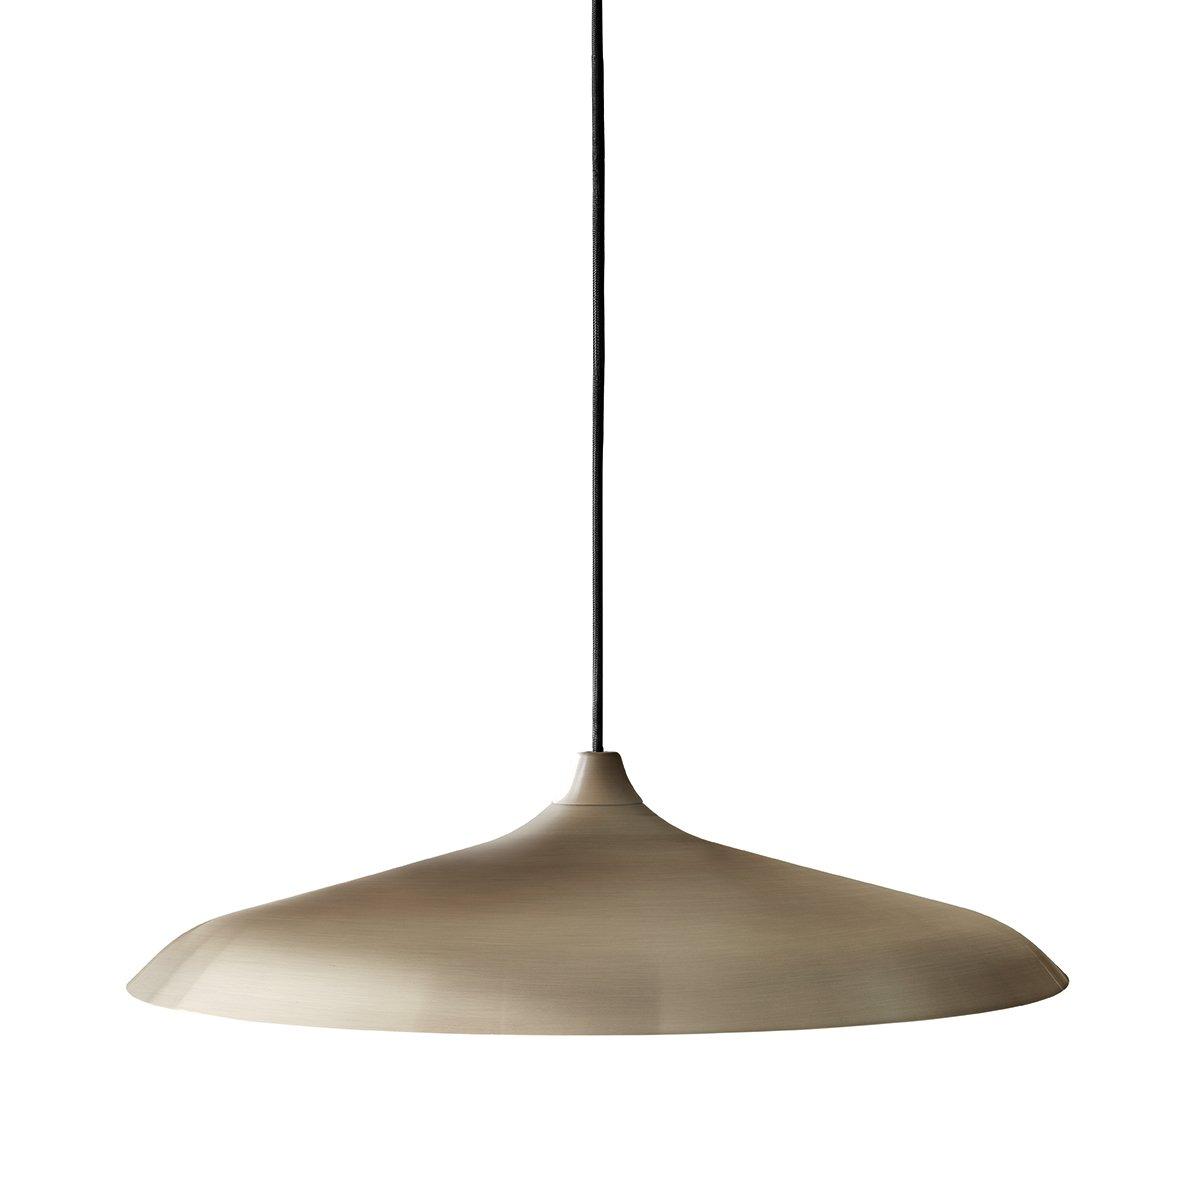 Menu Circular Hanglamp - Geborsteld Brons